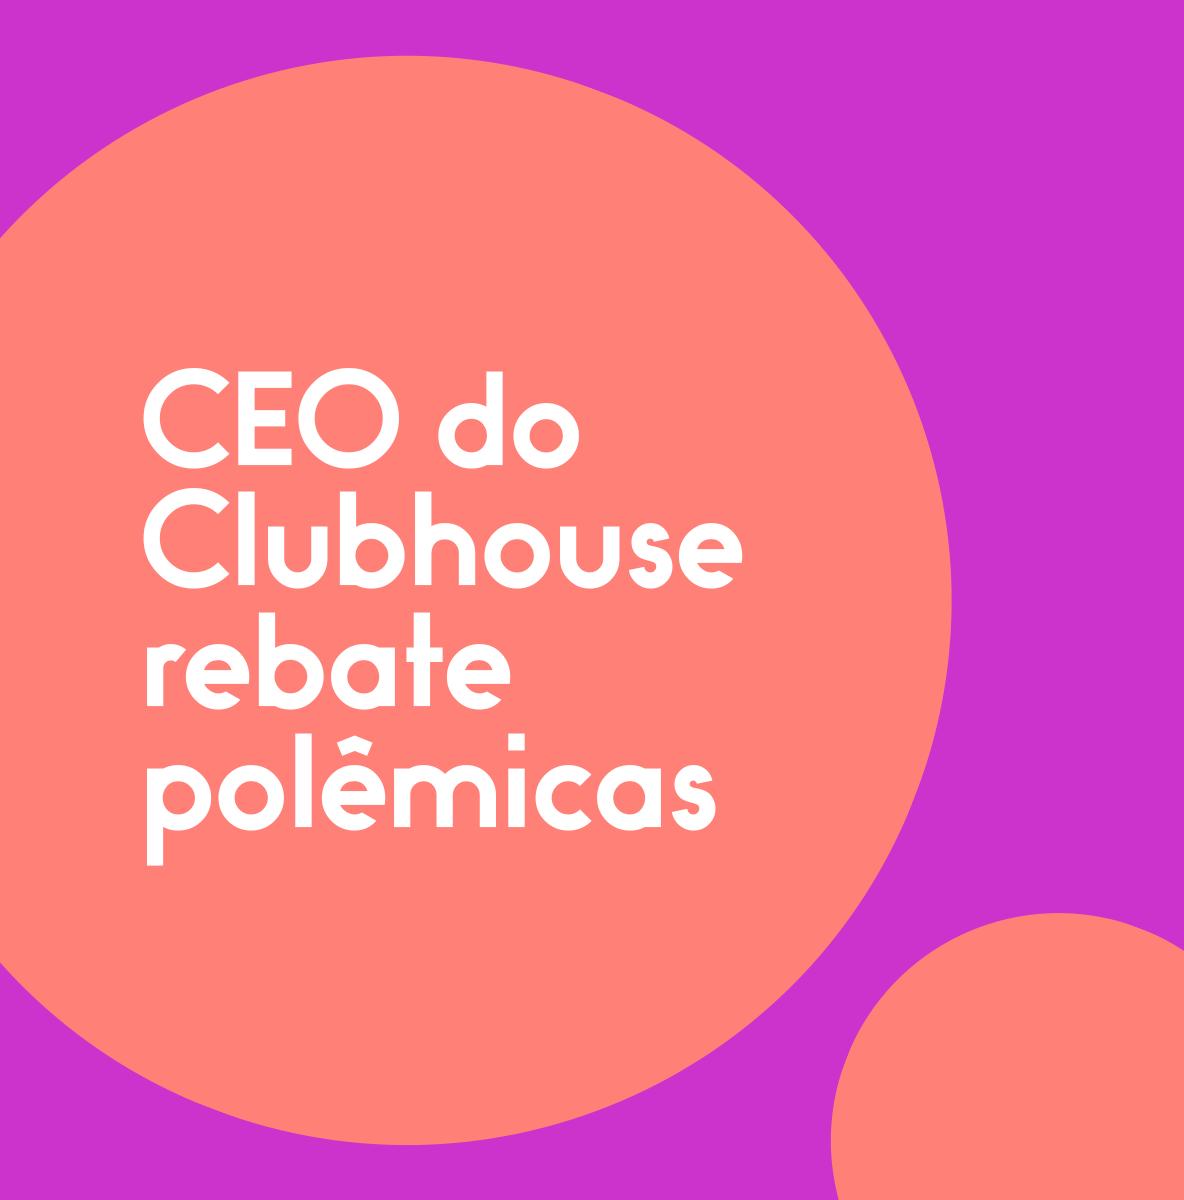 CEO-do-Clubhouse-rebate-polêmicas